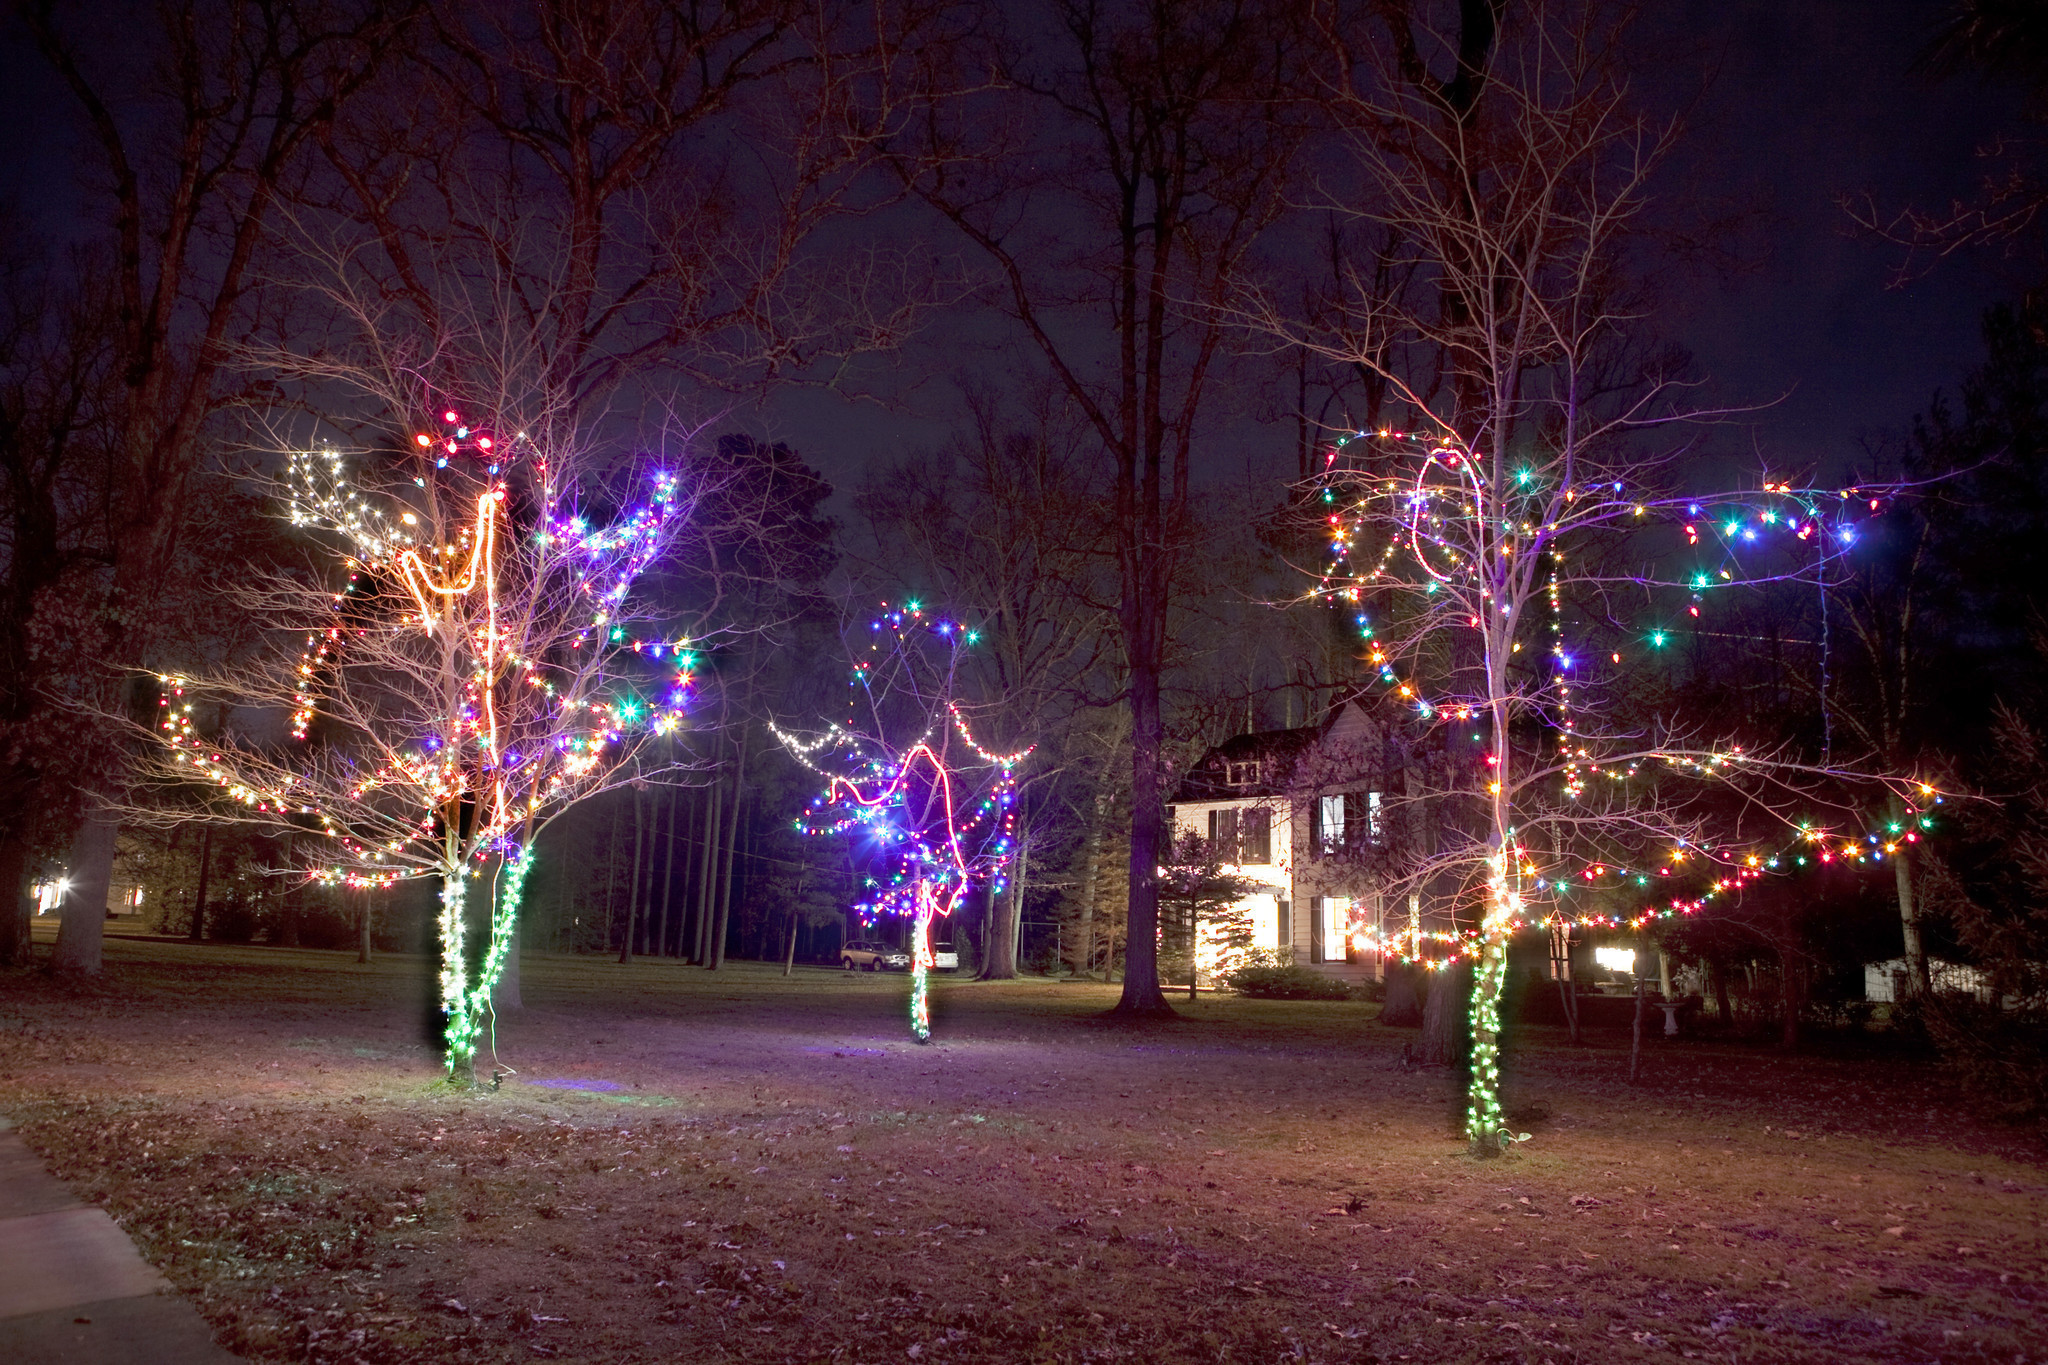 ashland virginia gives amtrak riders a holiday light spectacular chicago tribune - Christmas Light Train